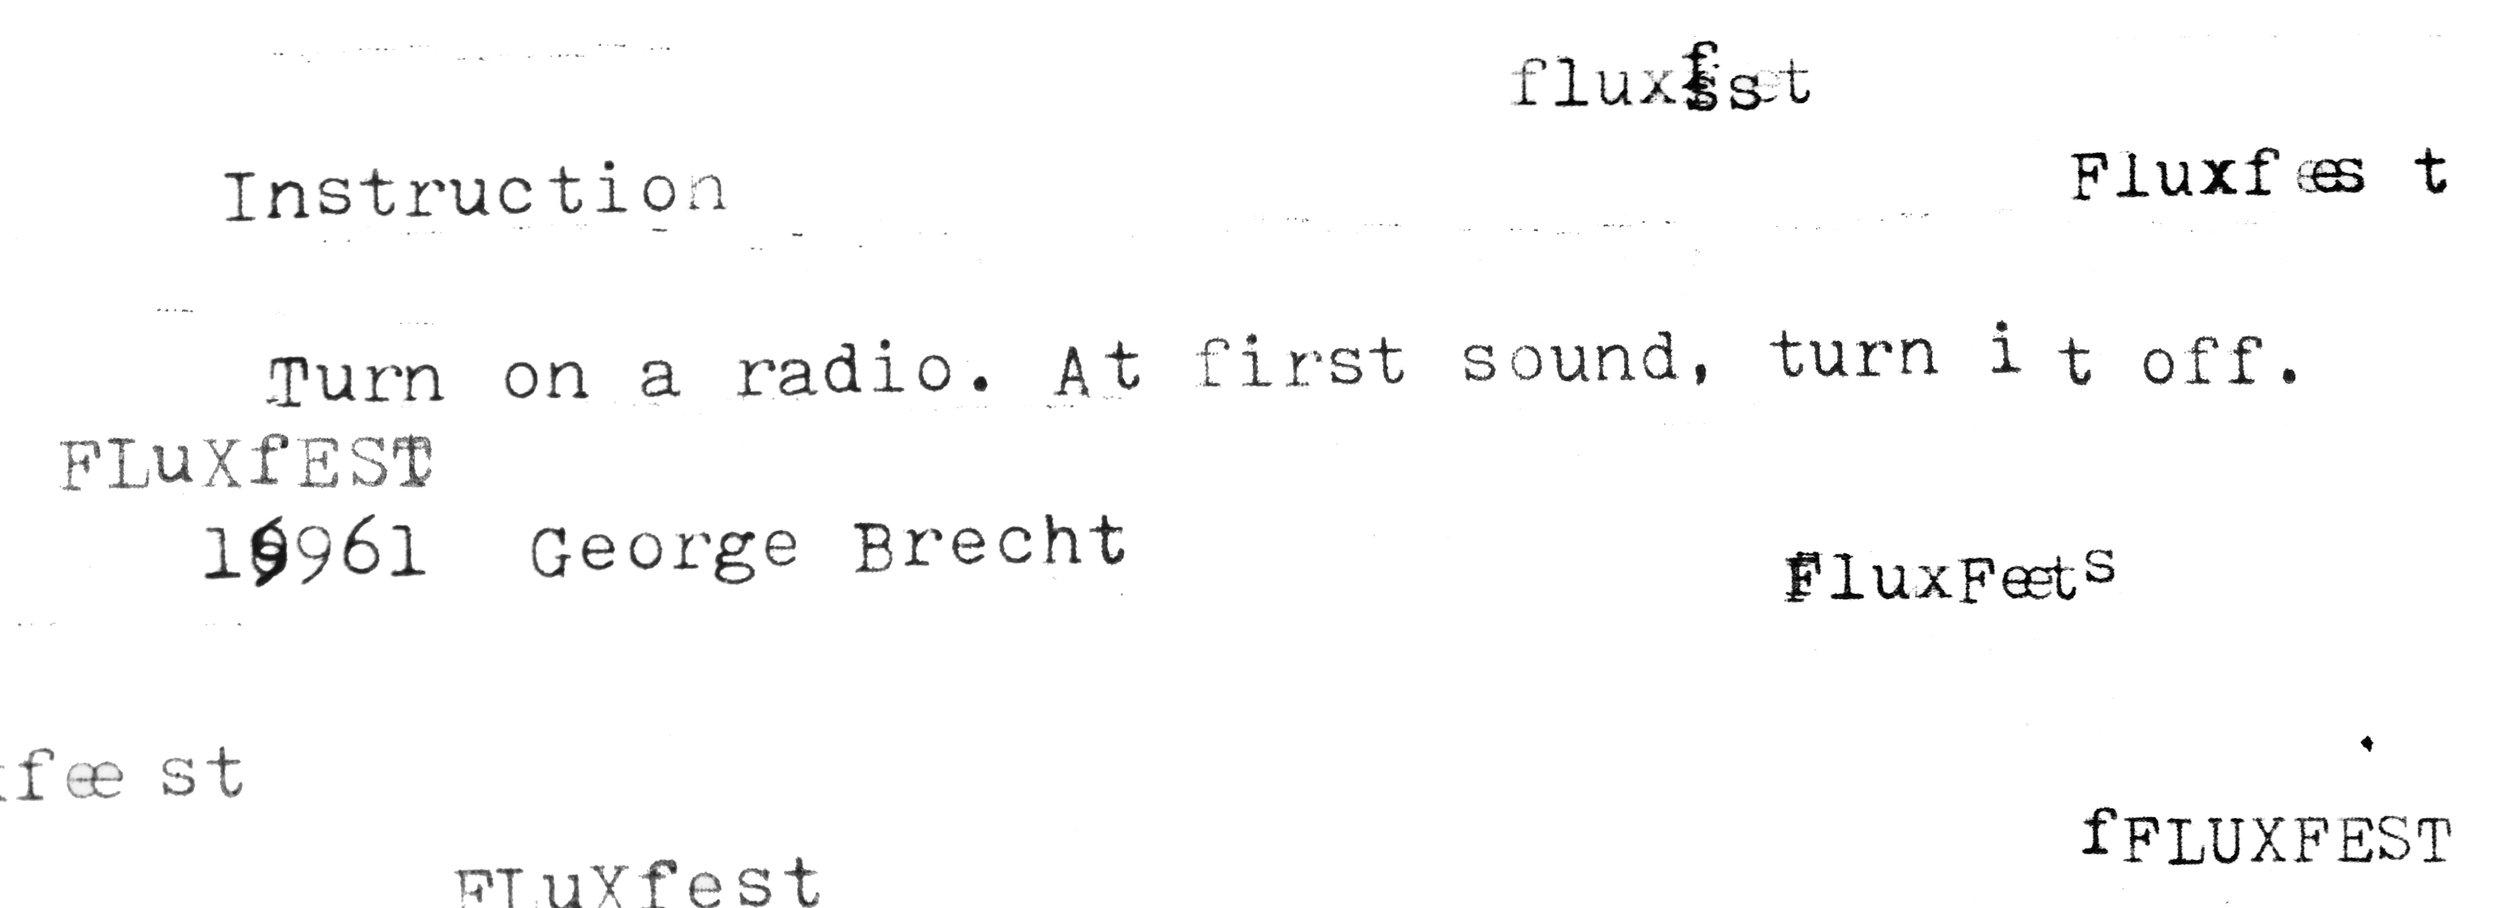 fluxpieces_radio.jpg